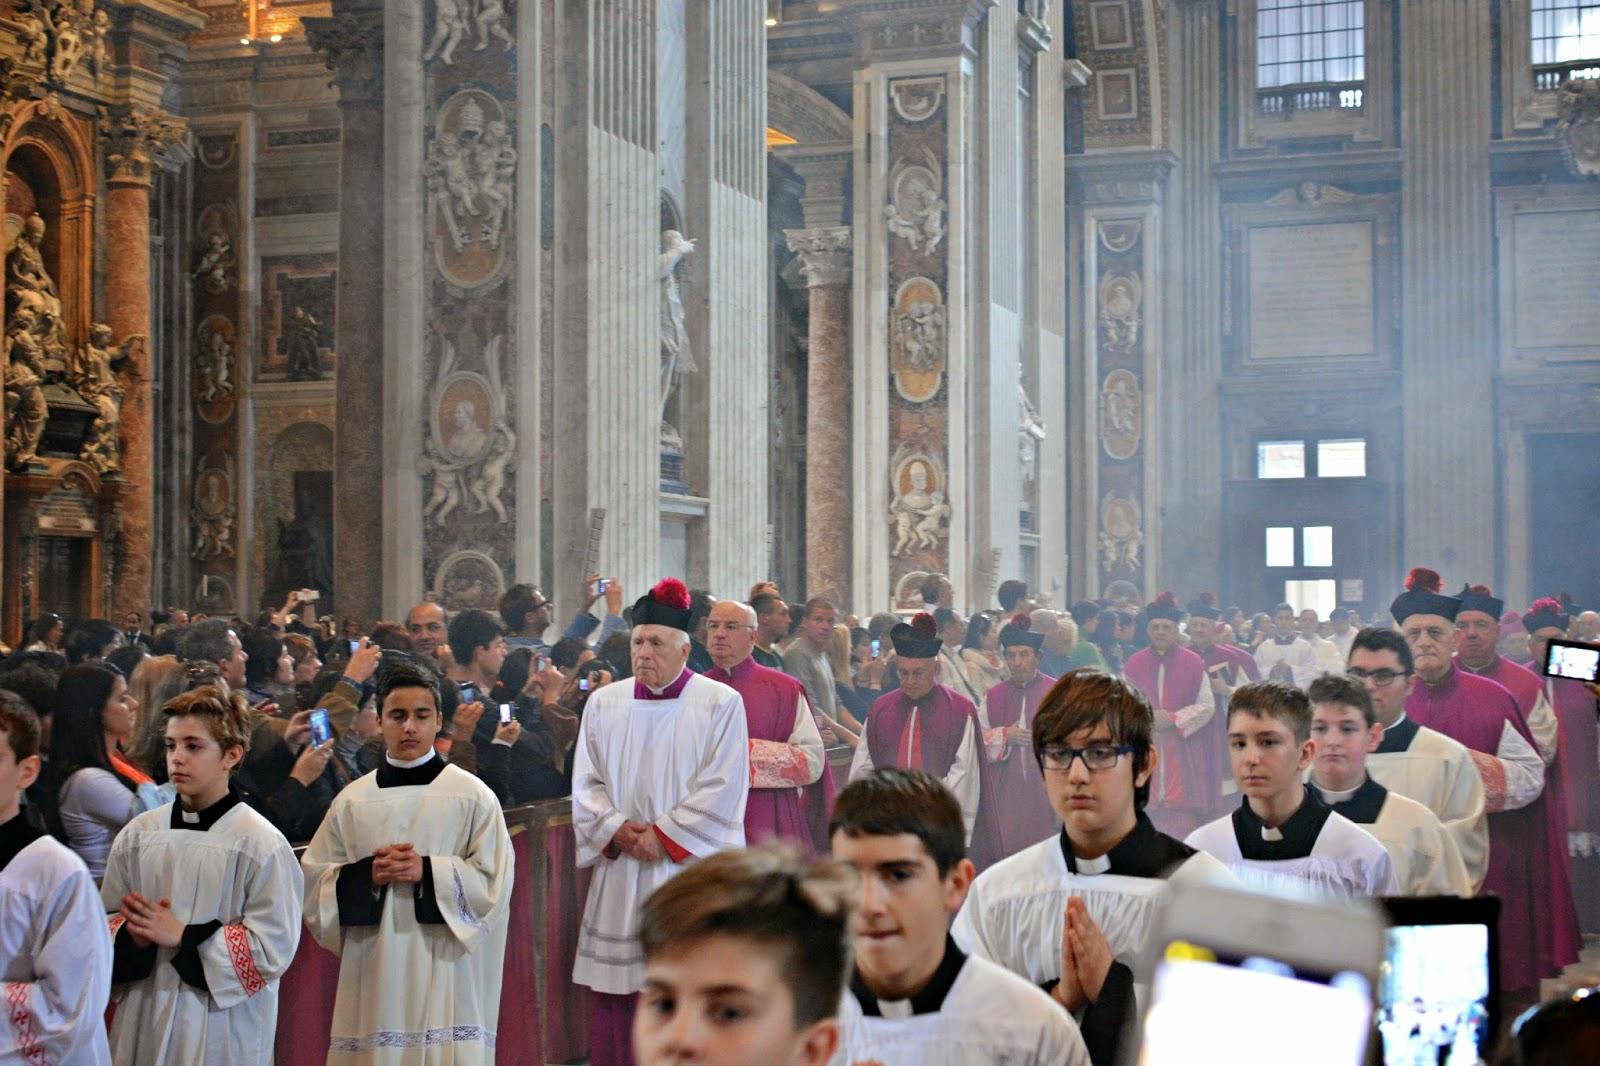 mass at st peter's basilica vatican city